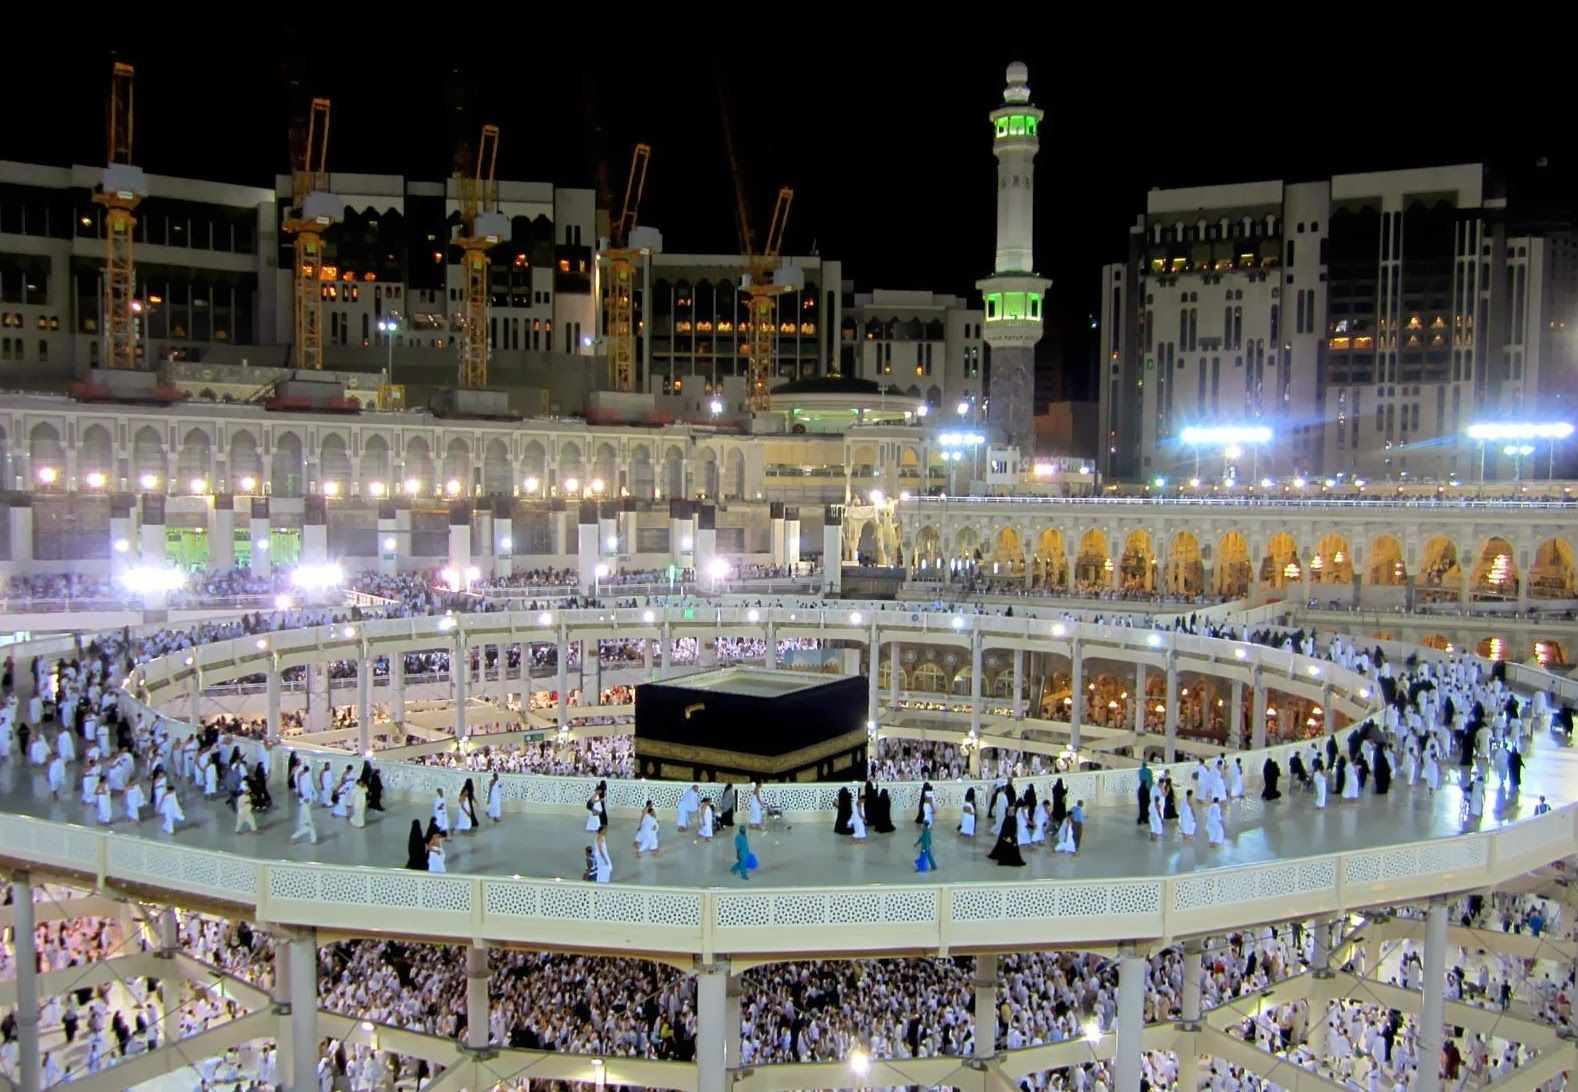 khana kaba wallpapers download free makkah pictures full